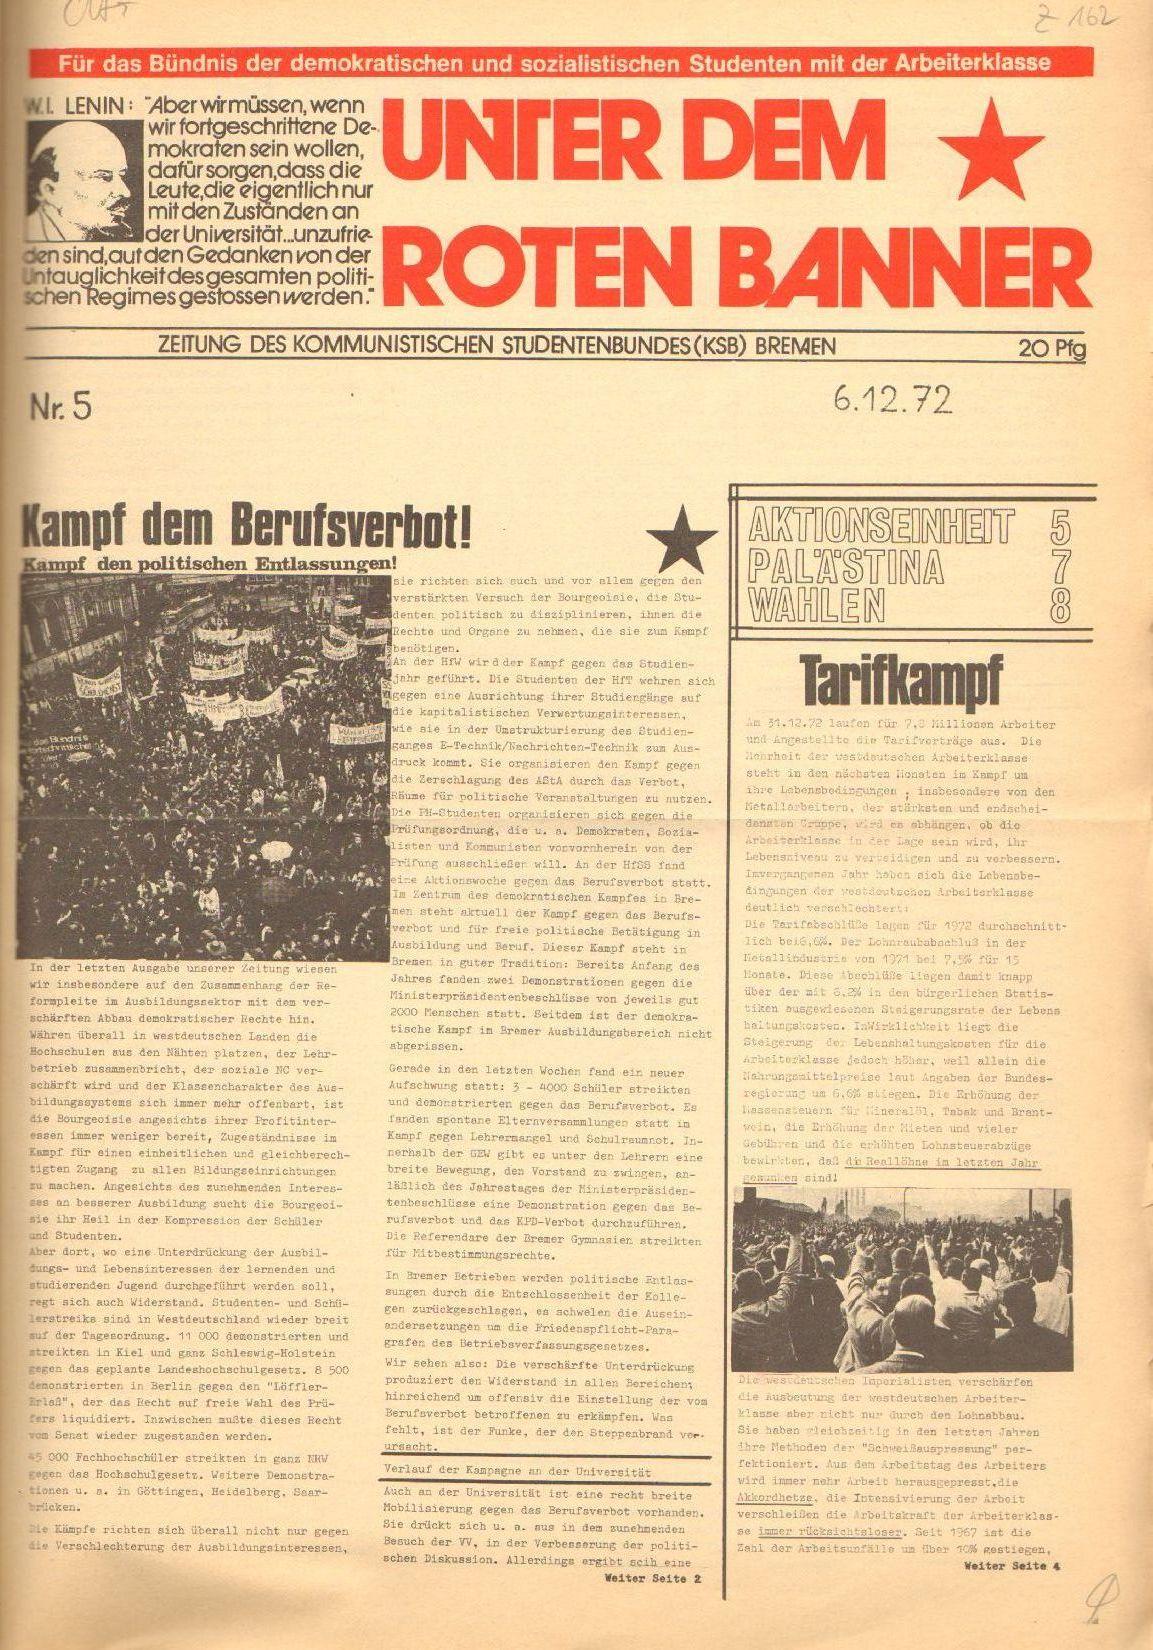 Bremen_Unter_dem_Roten_Banner032